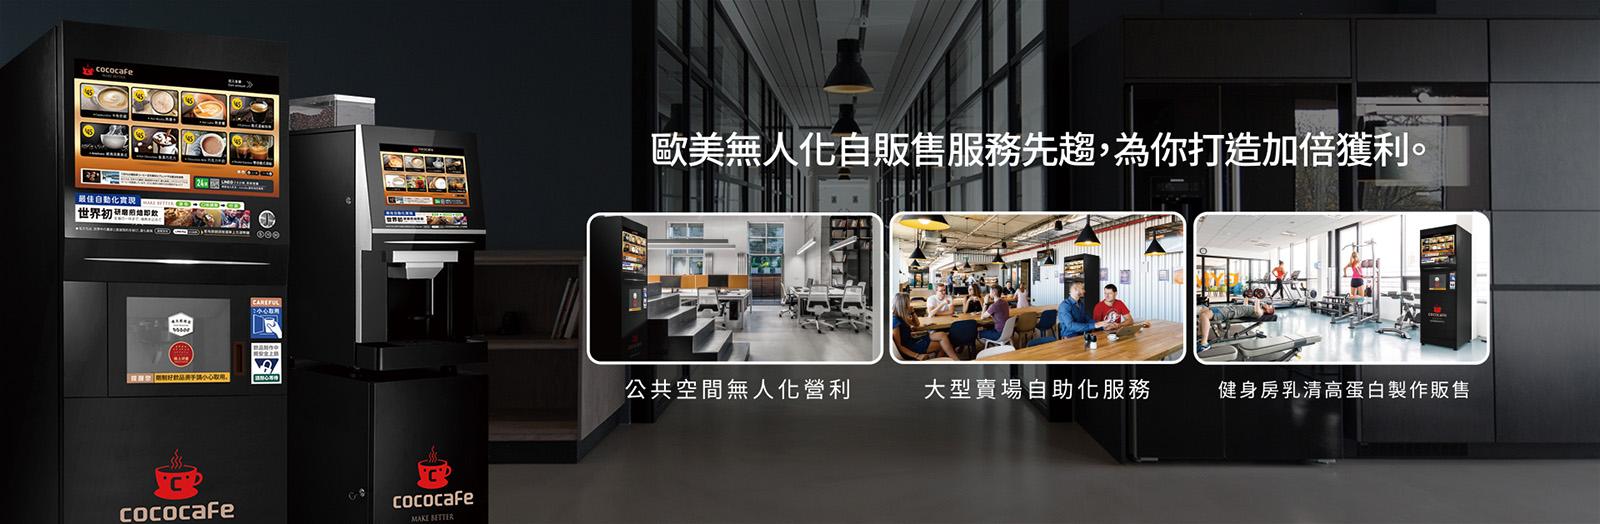 CoCoCafe無人咖啡機租賃-擺放案例-banner